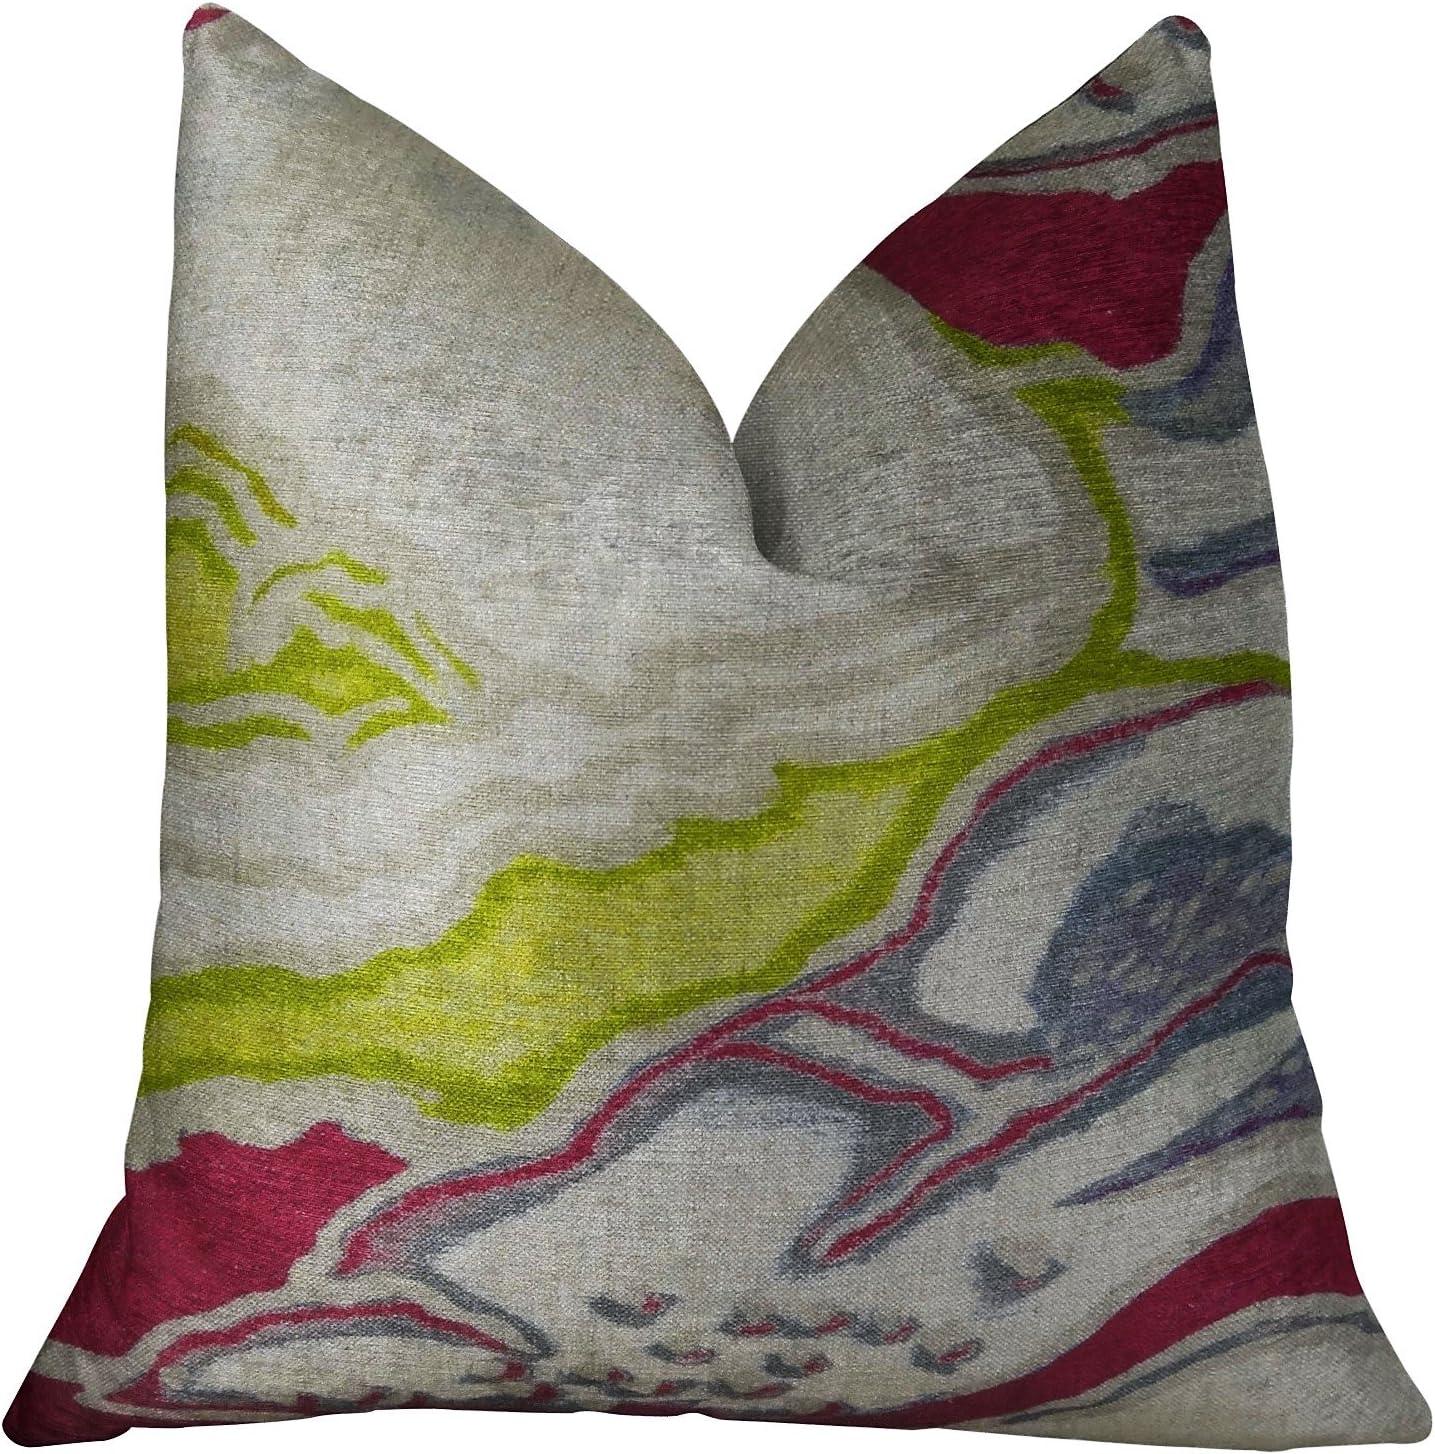 Plutus Brands Chattingham Handmade Throw Bombing new work Pillow 20 Discount mail order 12